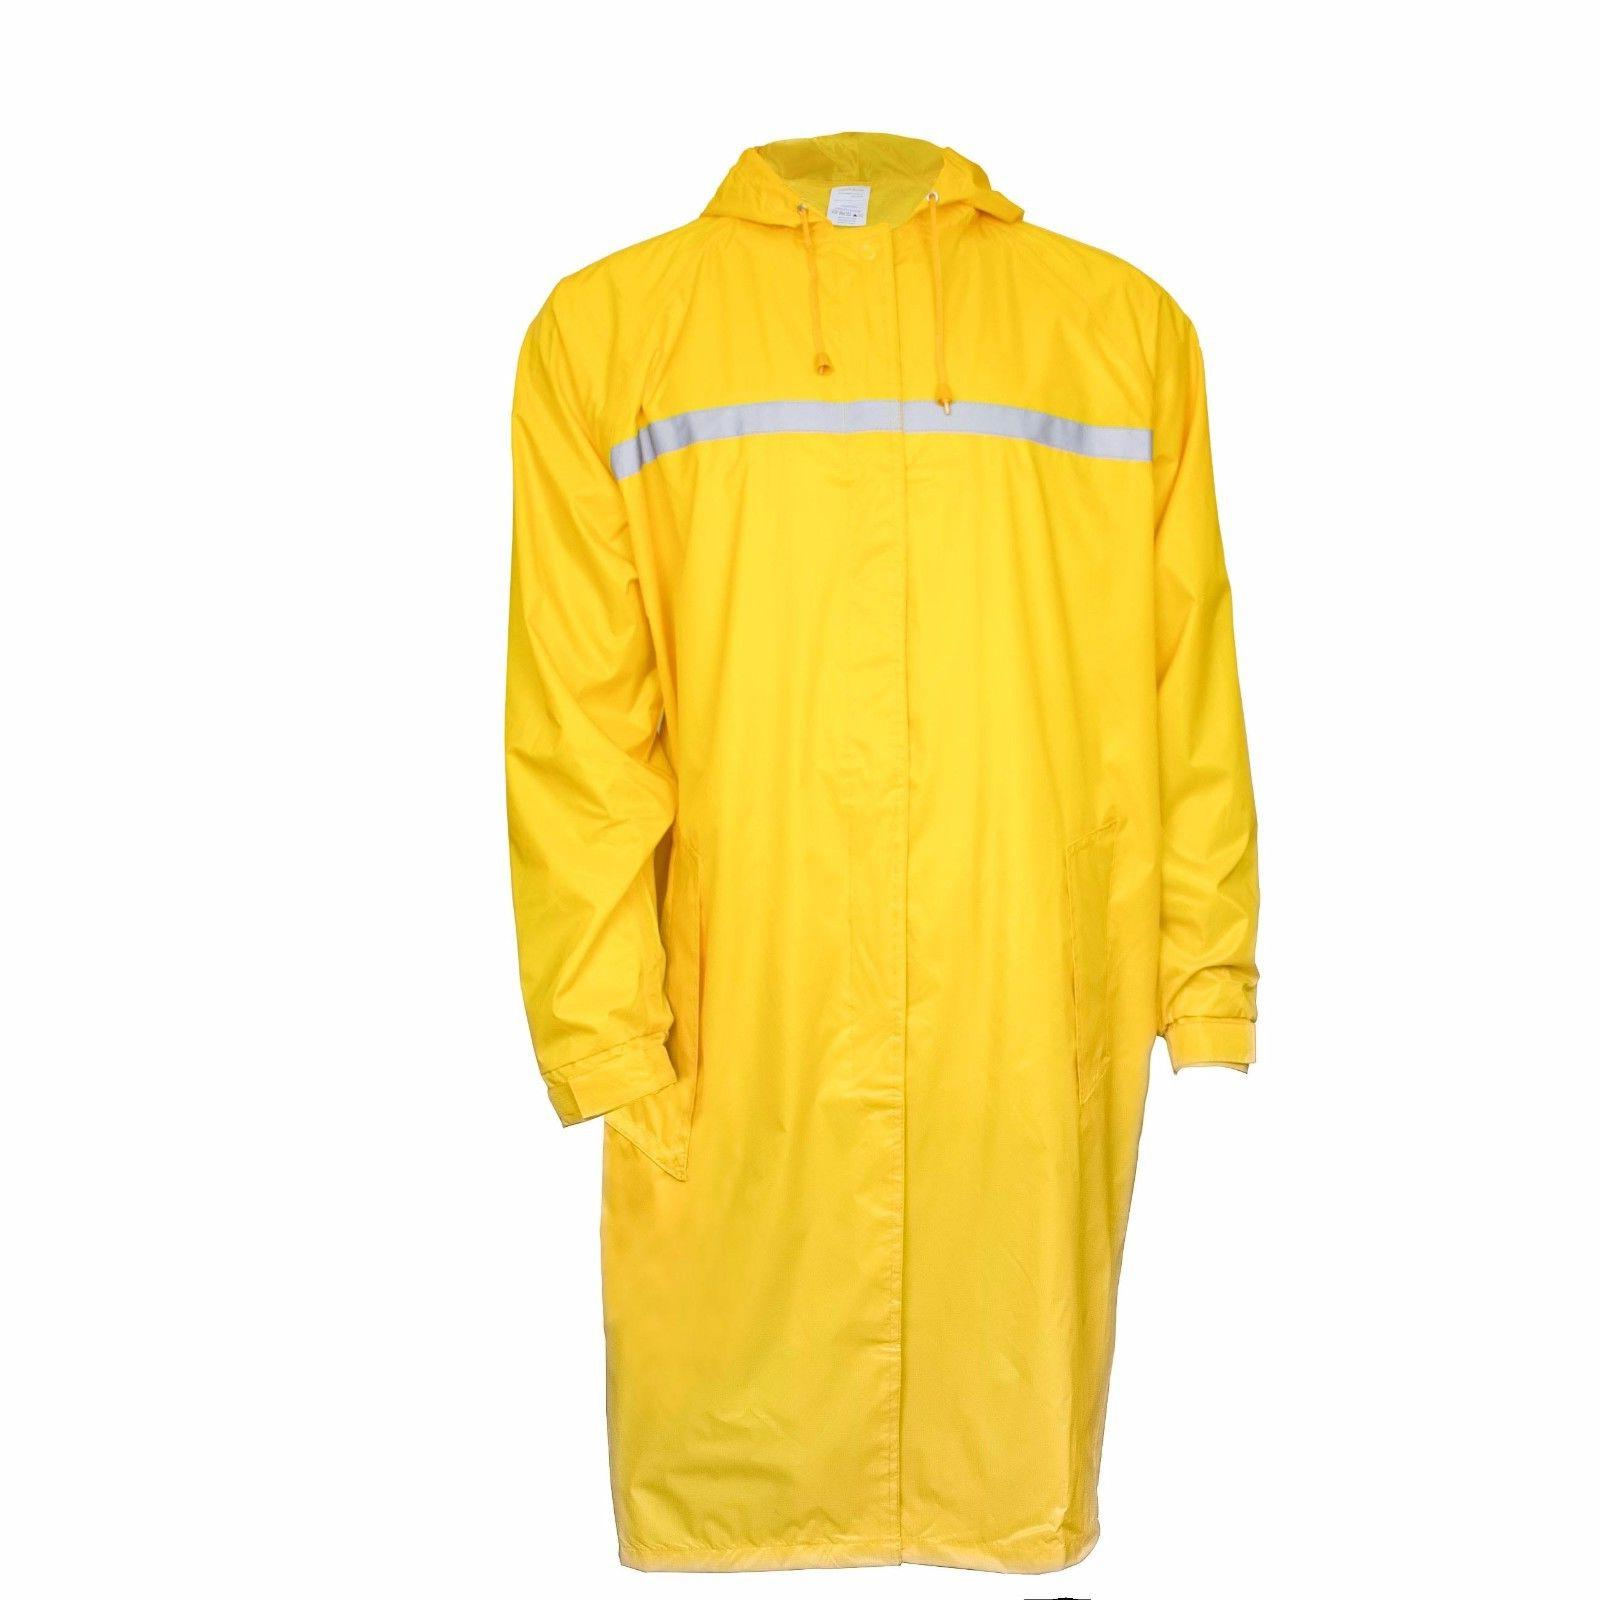 RK Rain Wear Men's Waterproof Long Raincoat Trench Coat, Yel